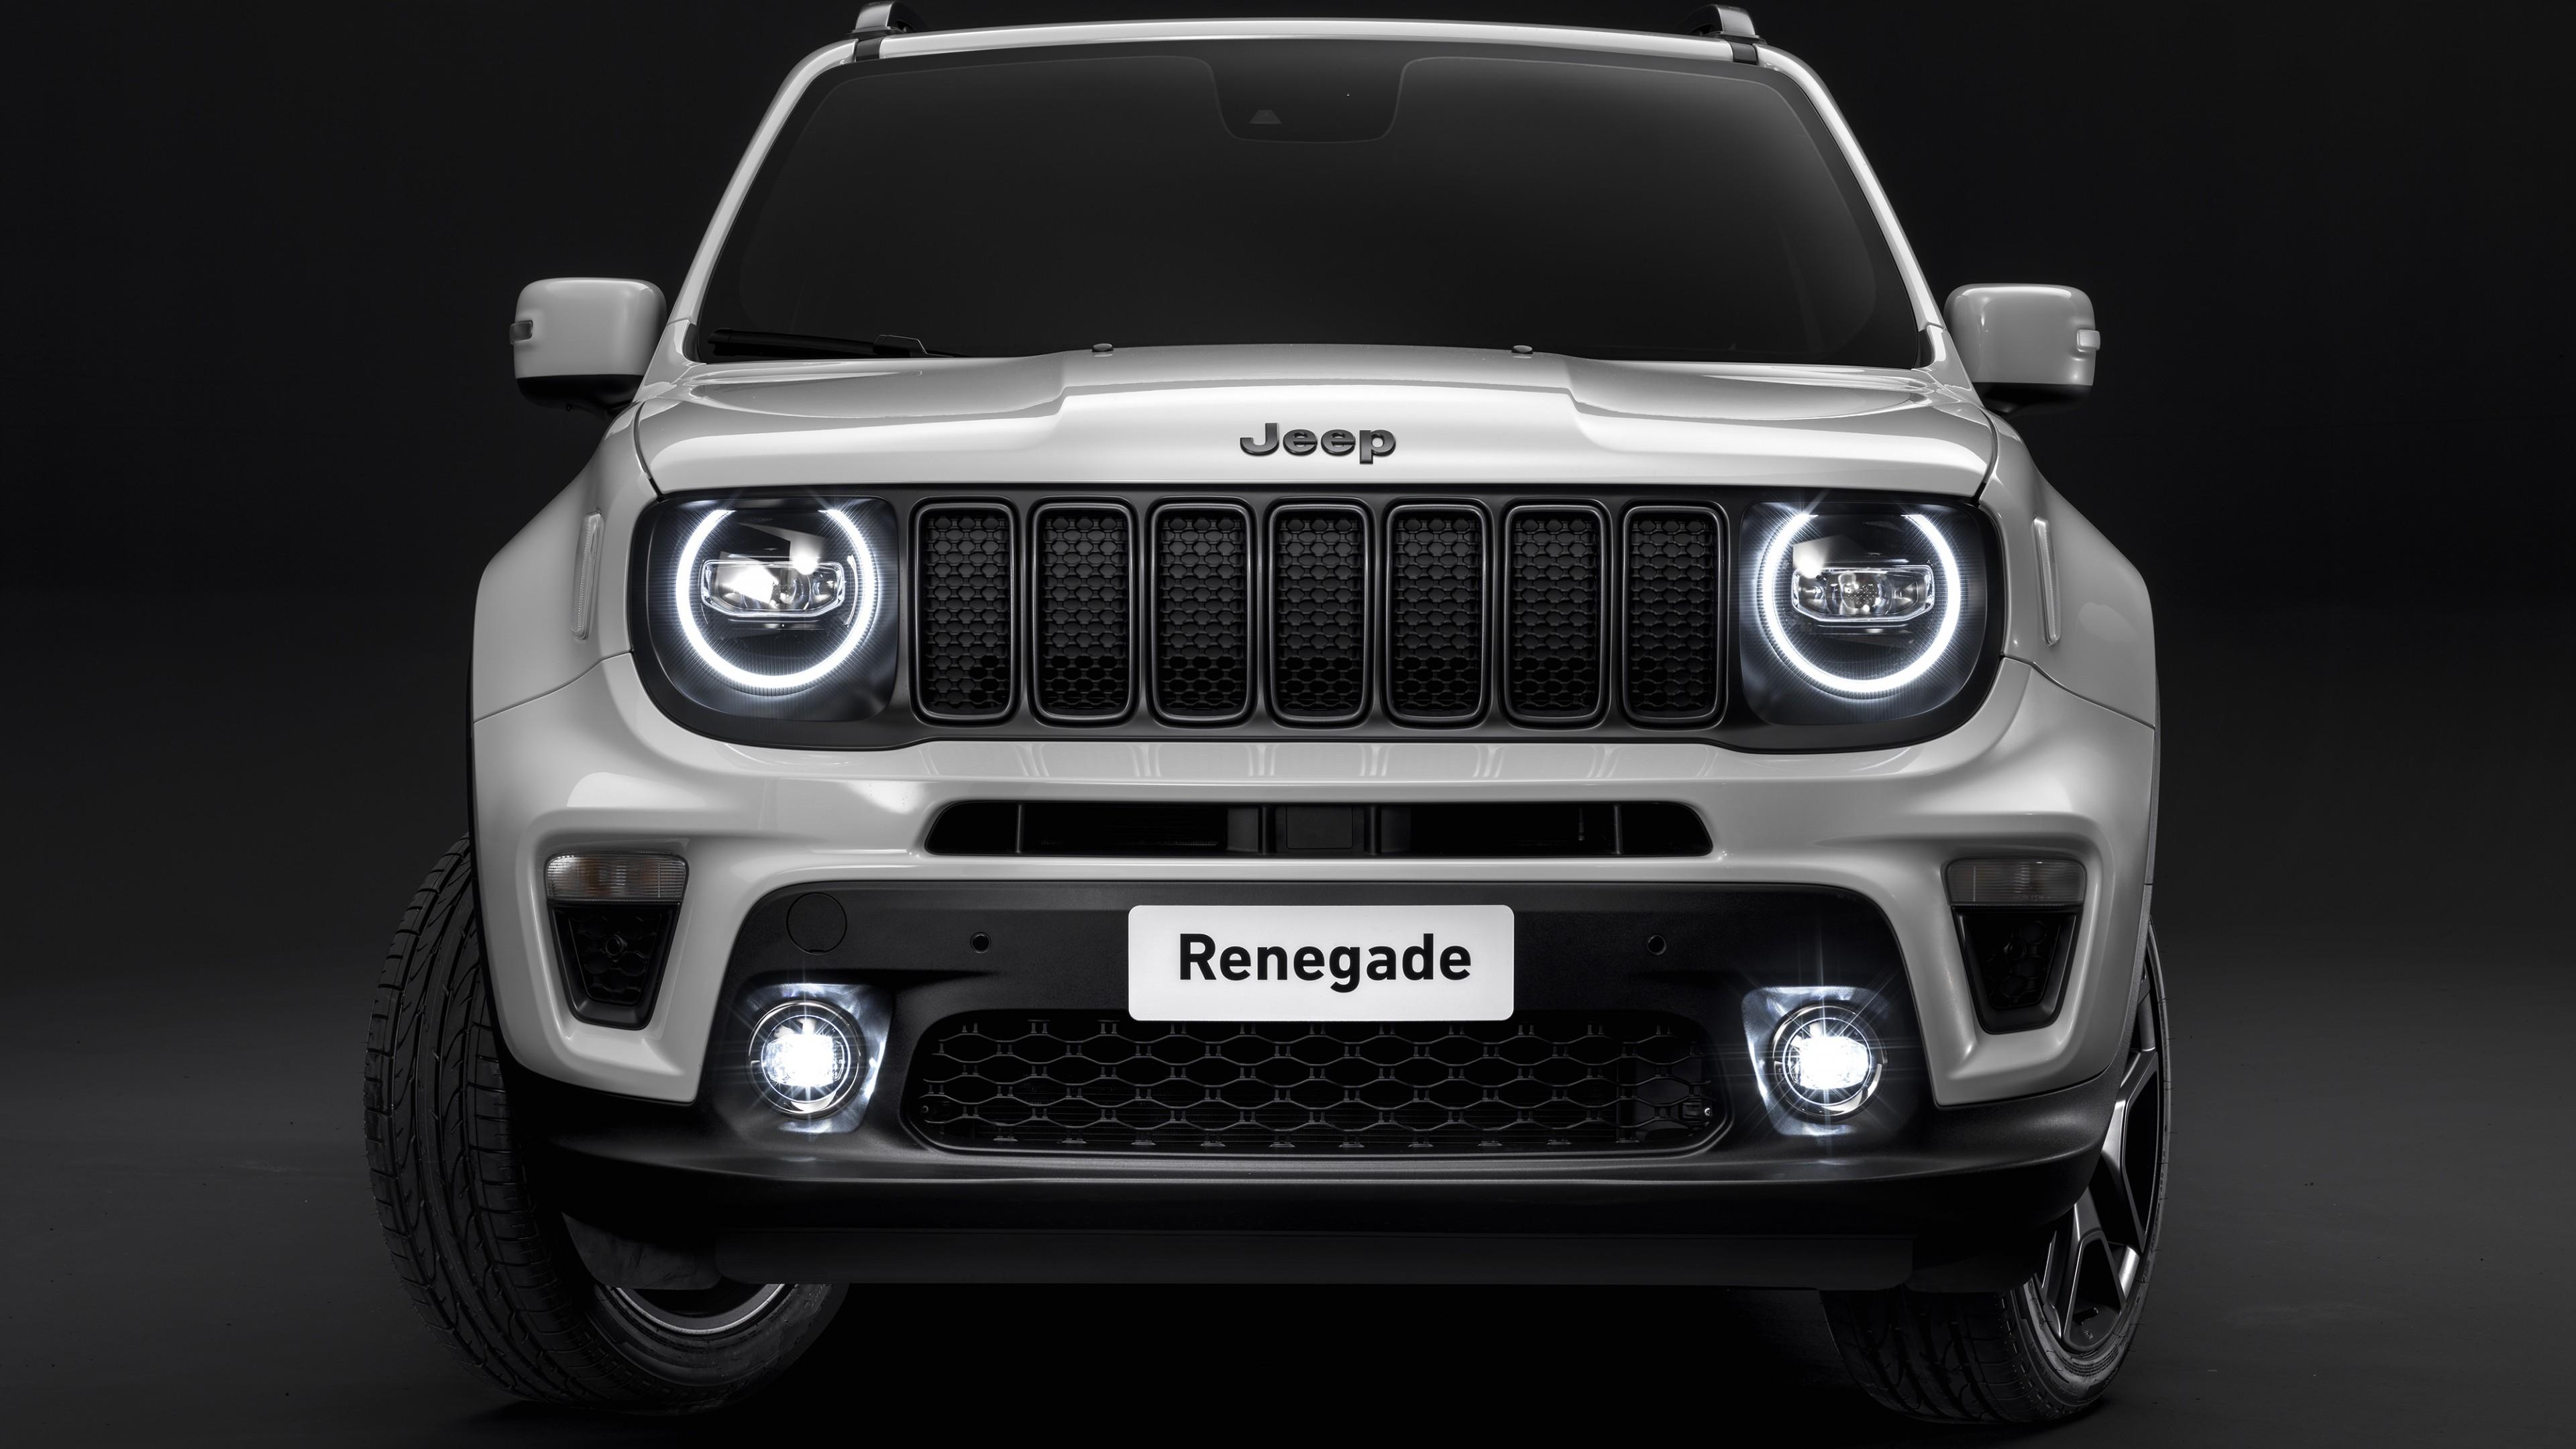 Jeep Renegade S 2019 4K Wallpaper   HD Car Wallpapers   ID ...